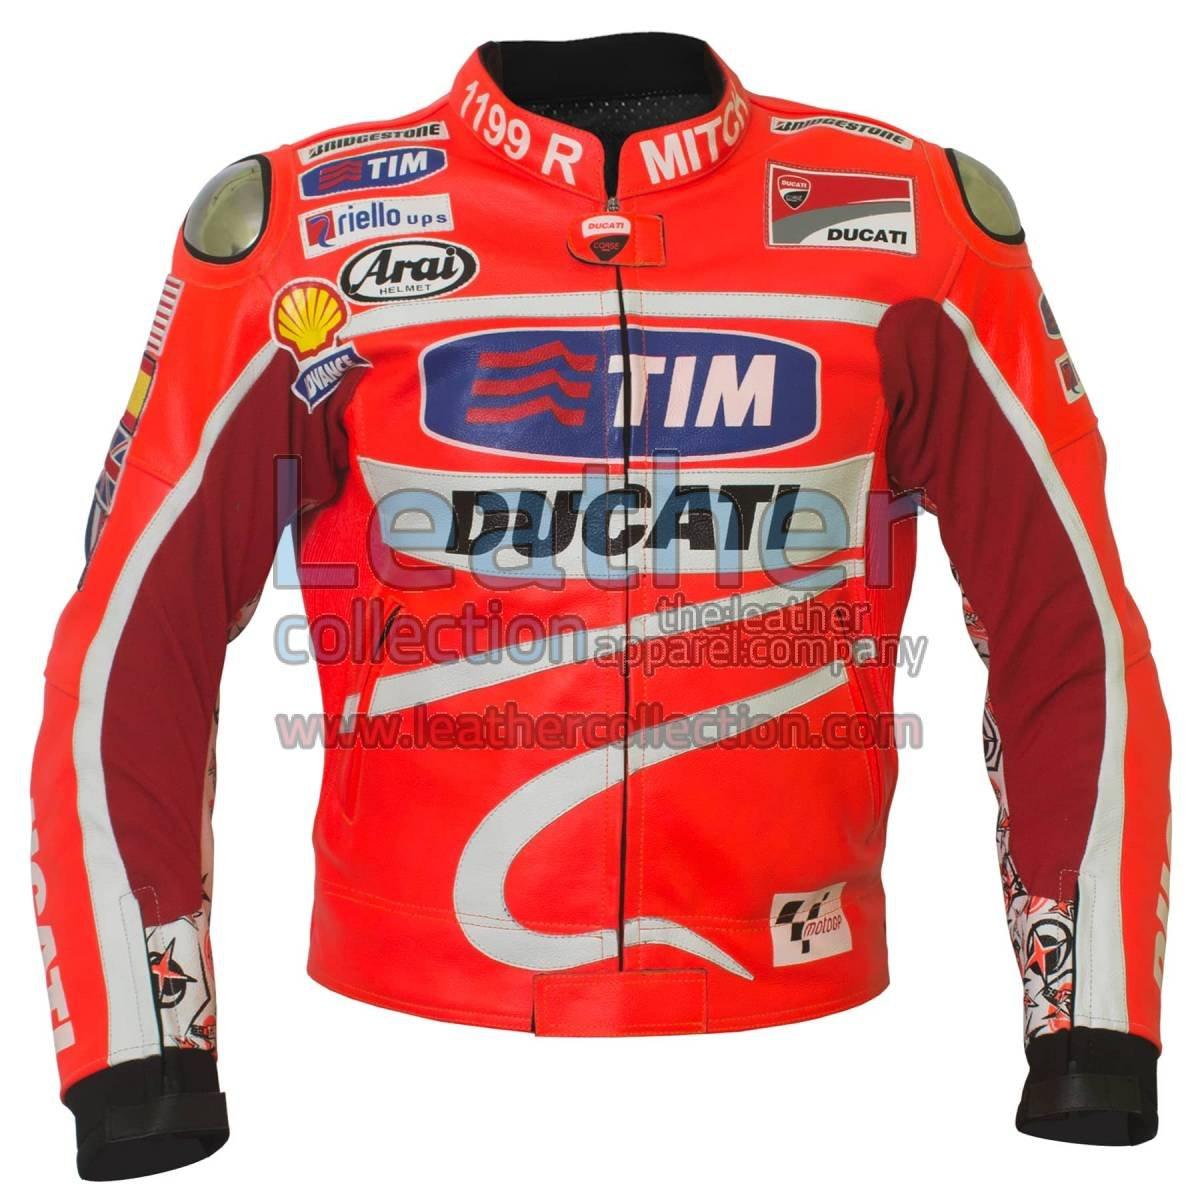 Nicky Hayden 2013 MotoGP Ducati Leather Jacket